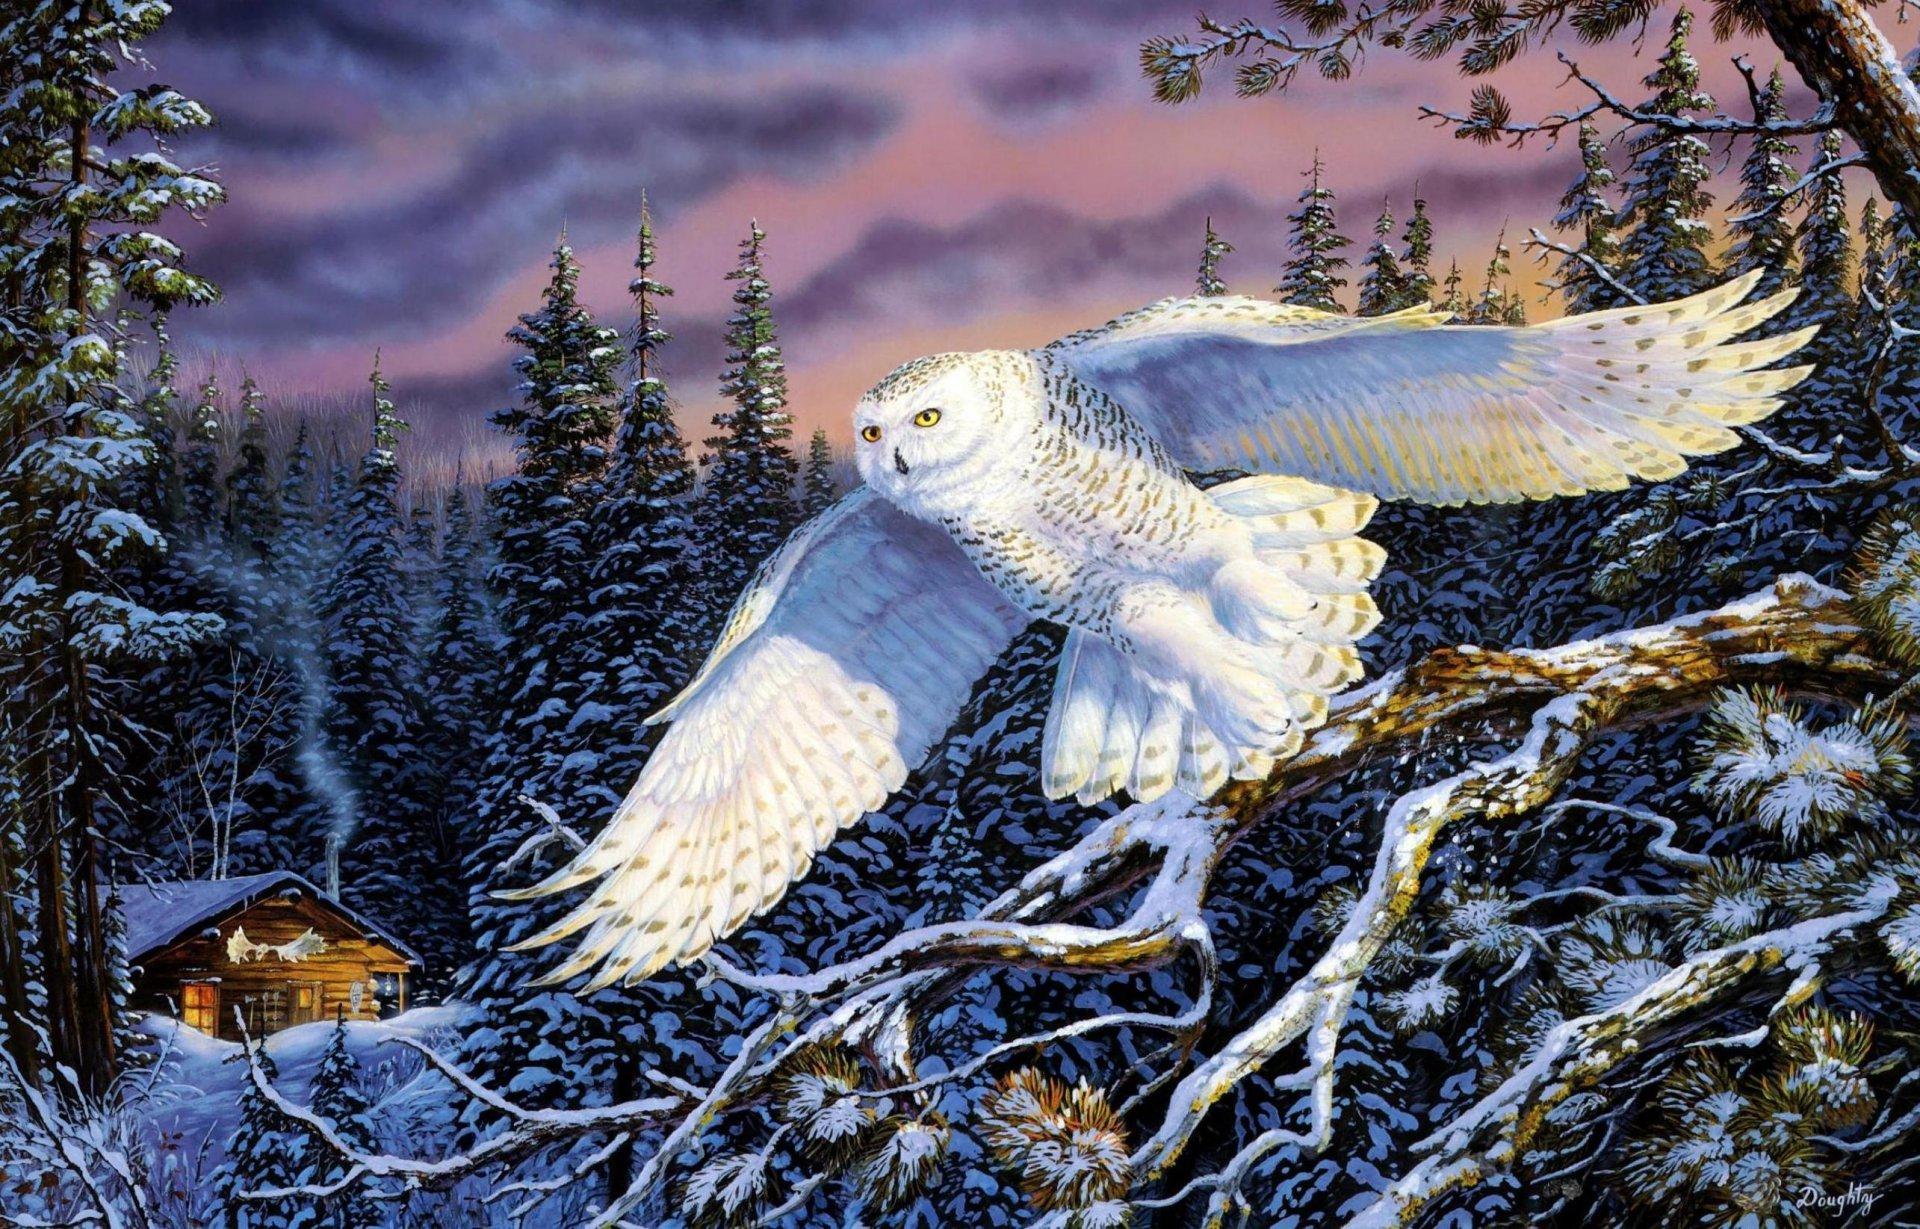 whisper-on-the-wind-terry-doughty-painting-snow-owl-zhivopis-pejzazhi-priroda-sova-zima-les-eli-xizhina